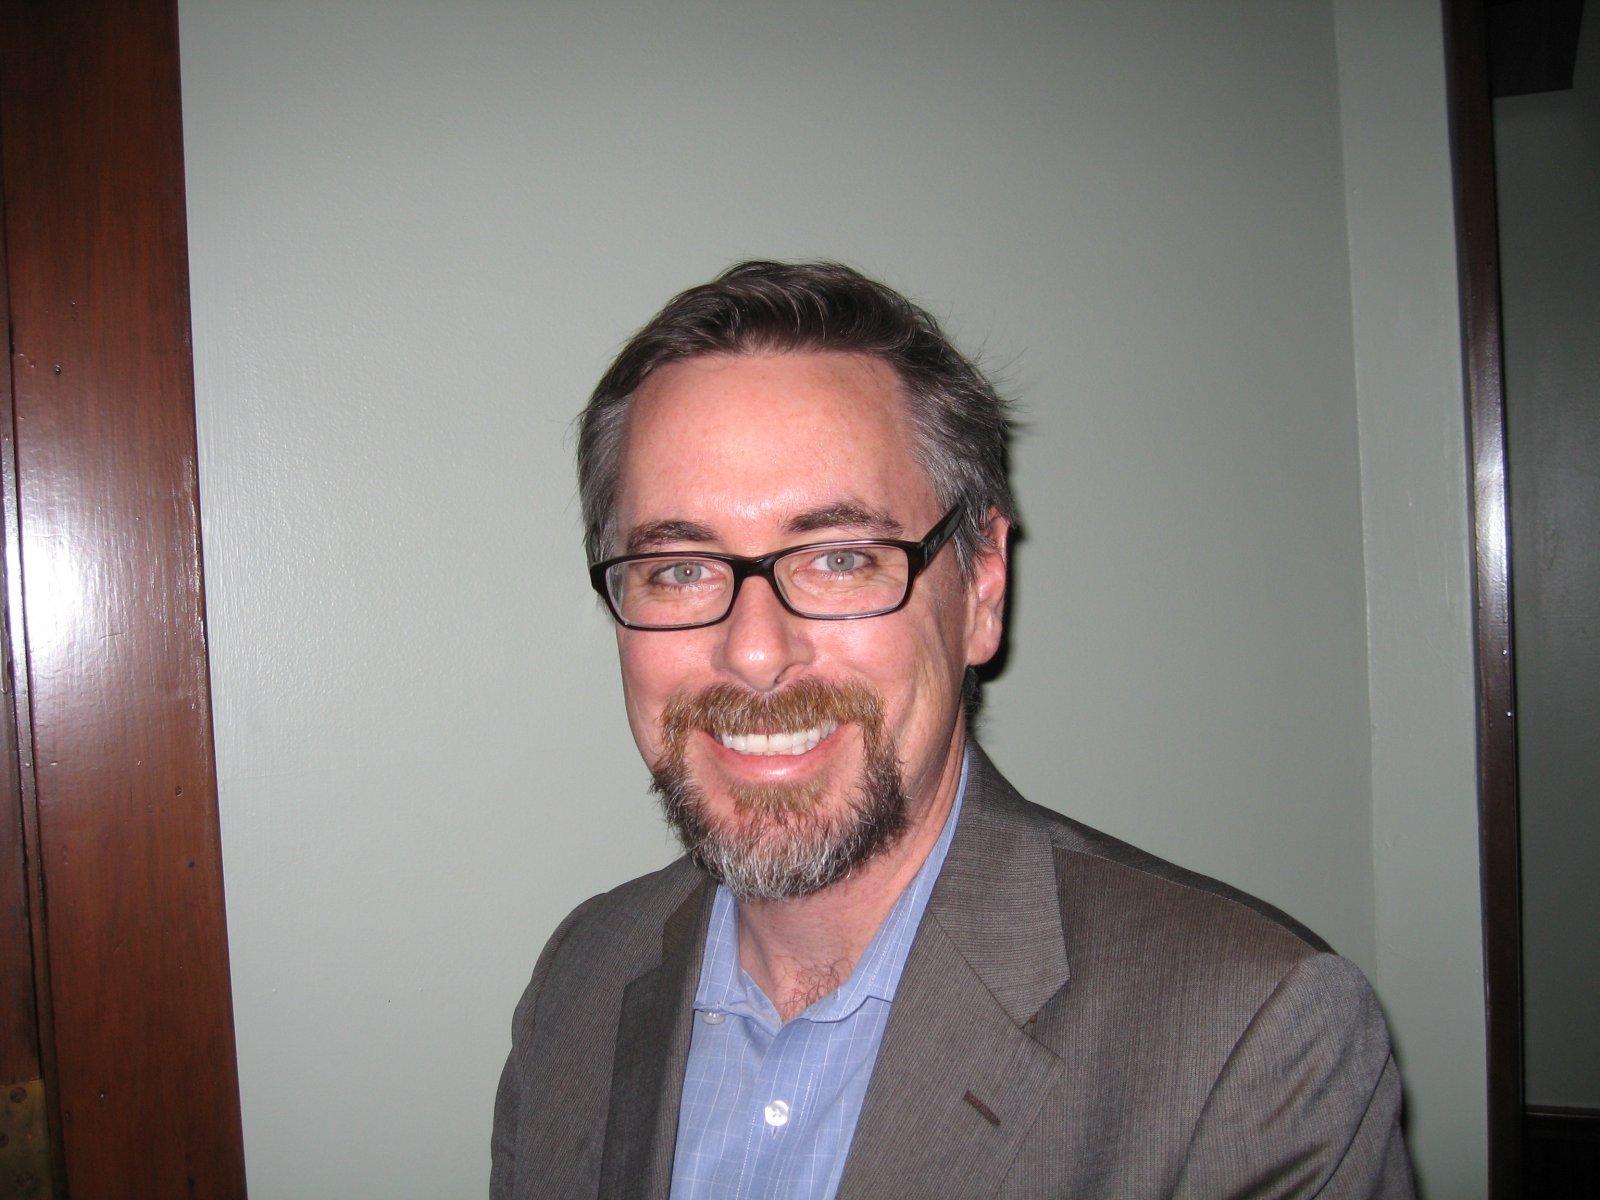 Dennis Kois